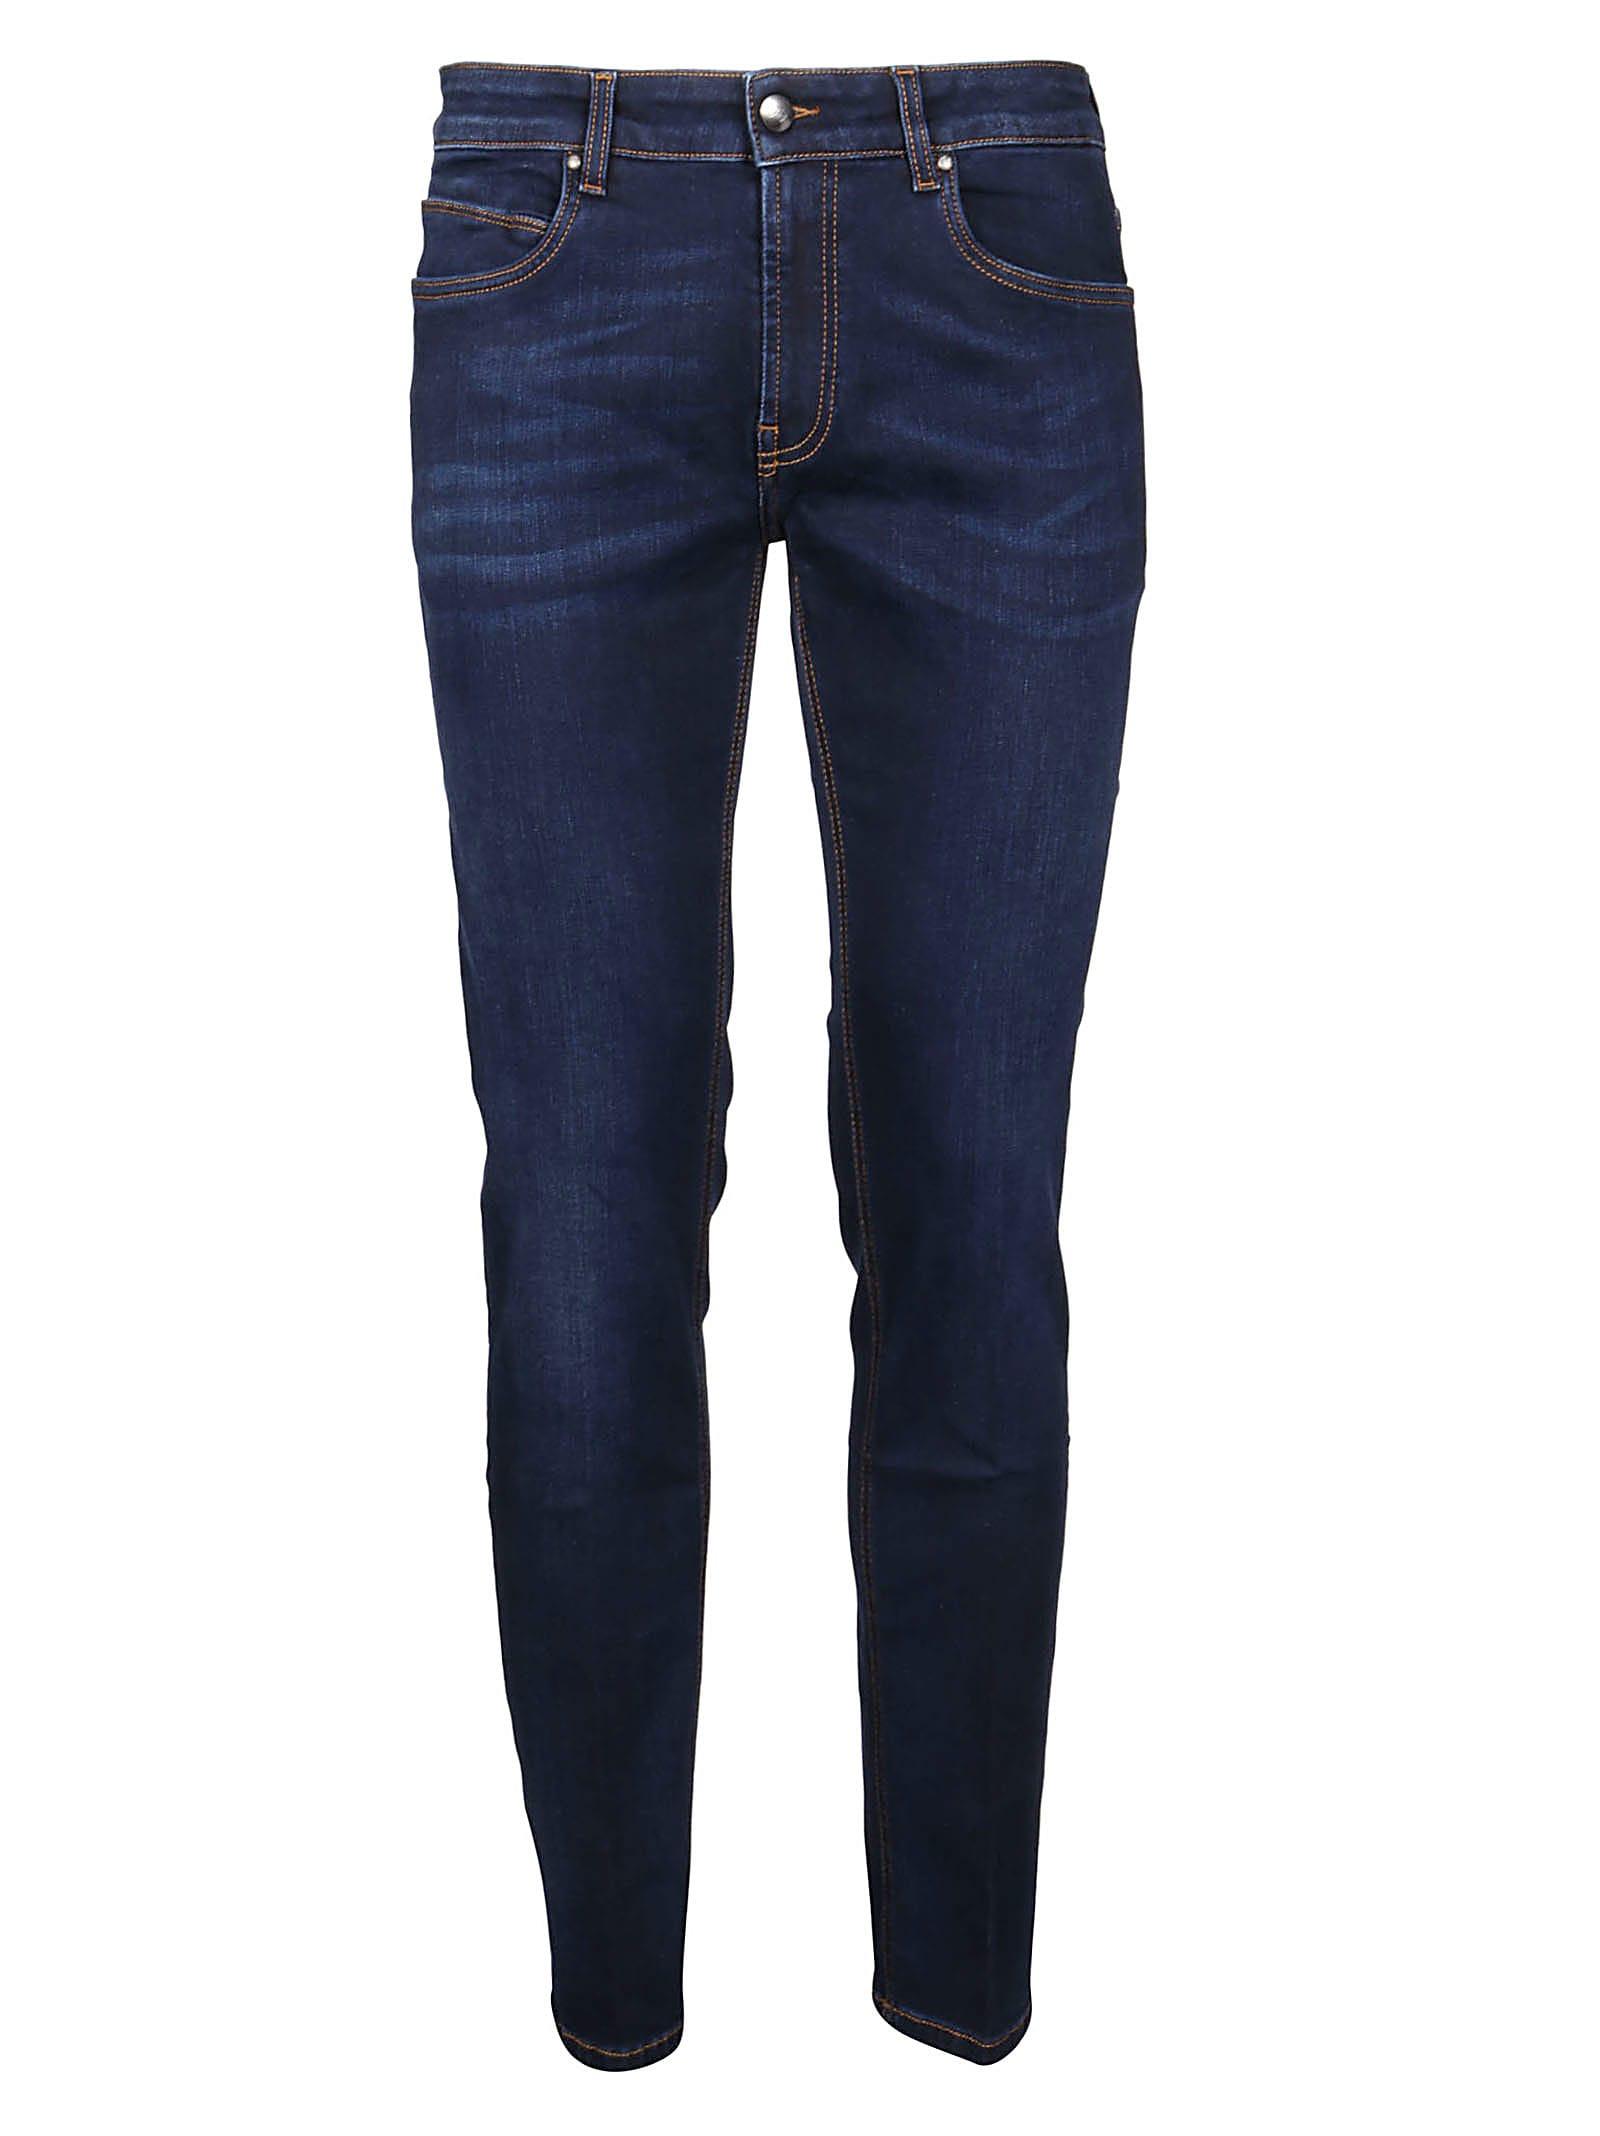 Fay Pantalone 5 Tasche Original